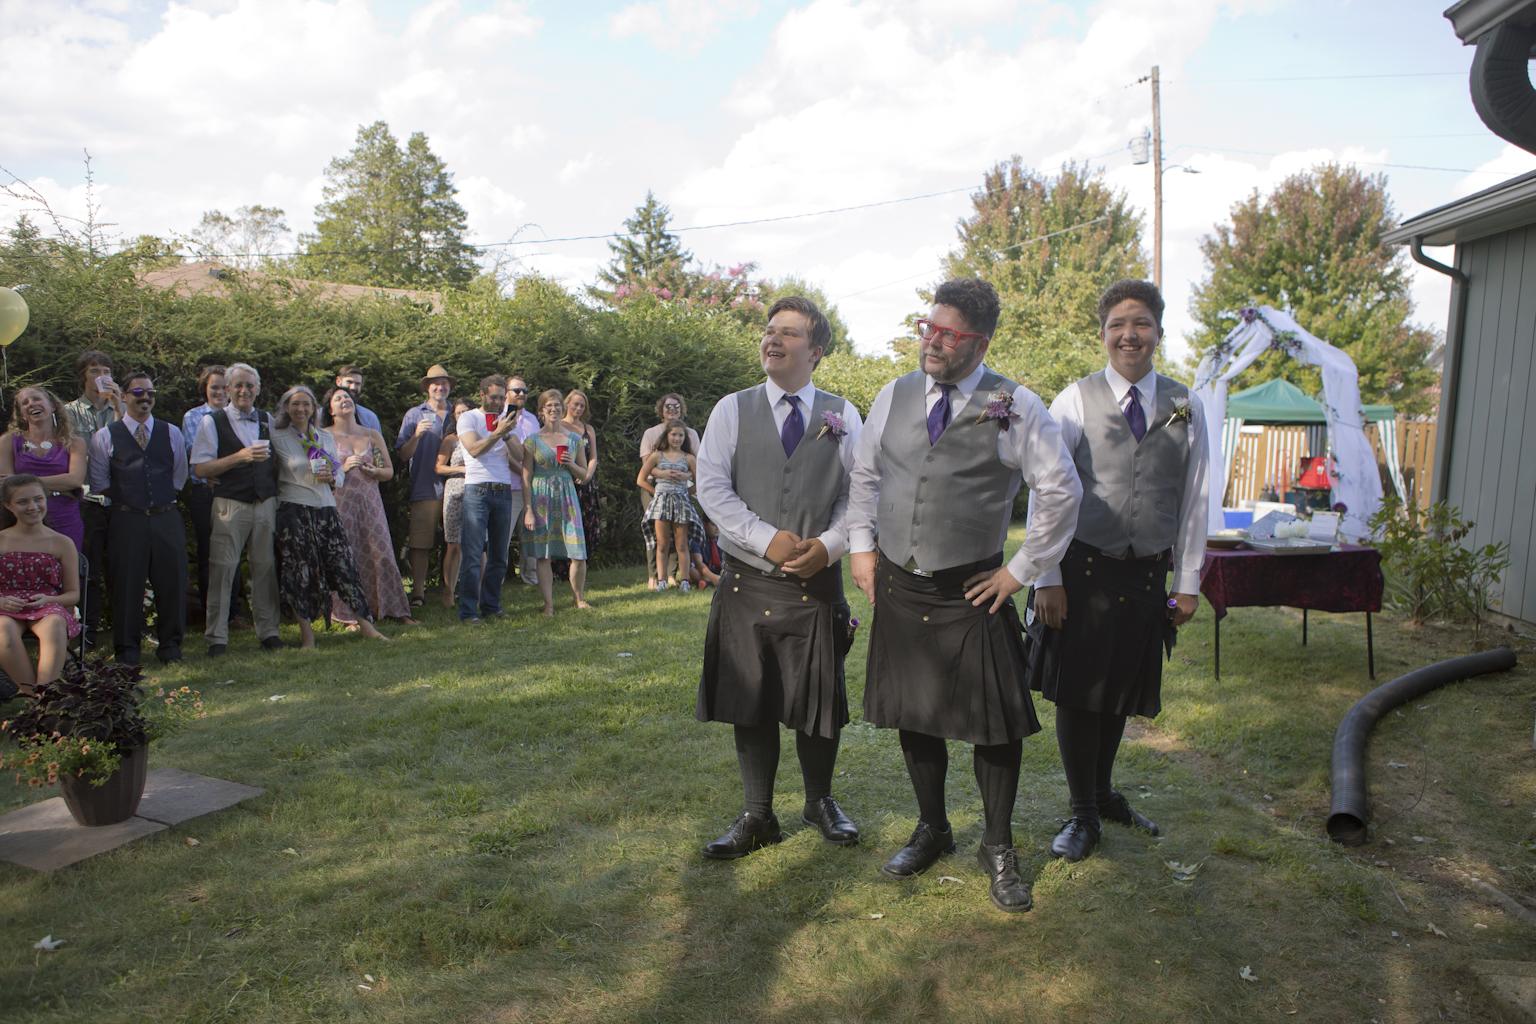 Tina and Adam wedding_Studio Misha Wedding Photography Asheville Photographer and Videographer00053.JPG